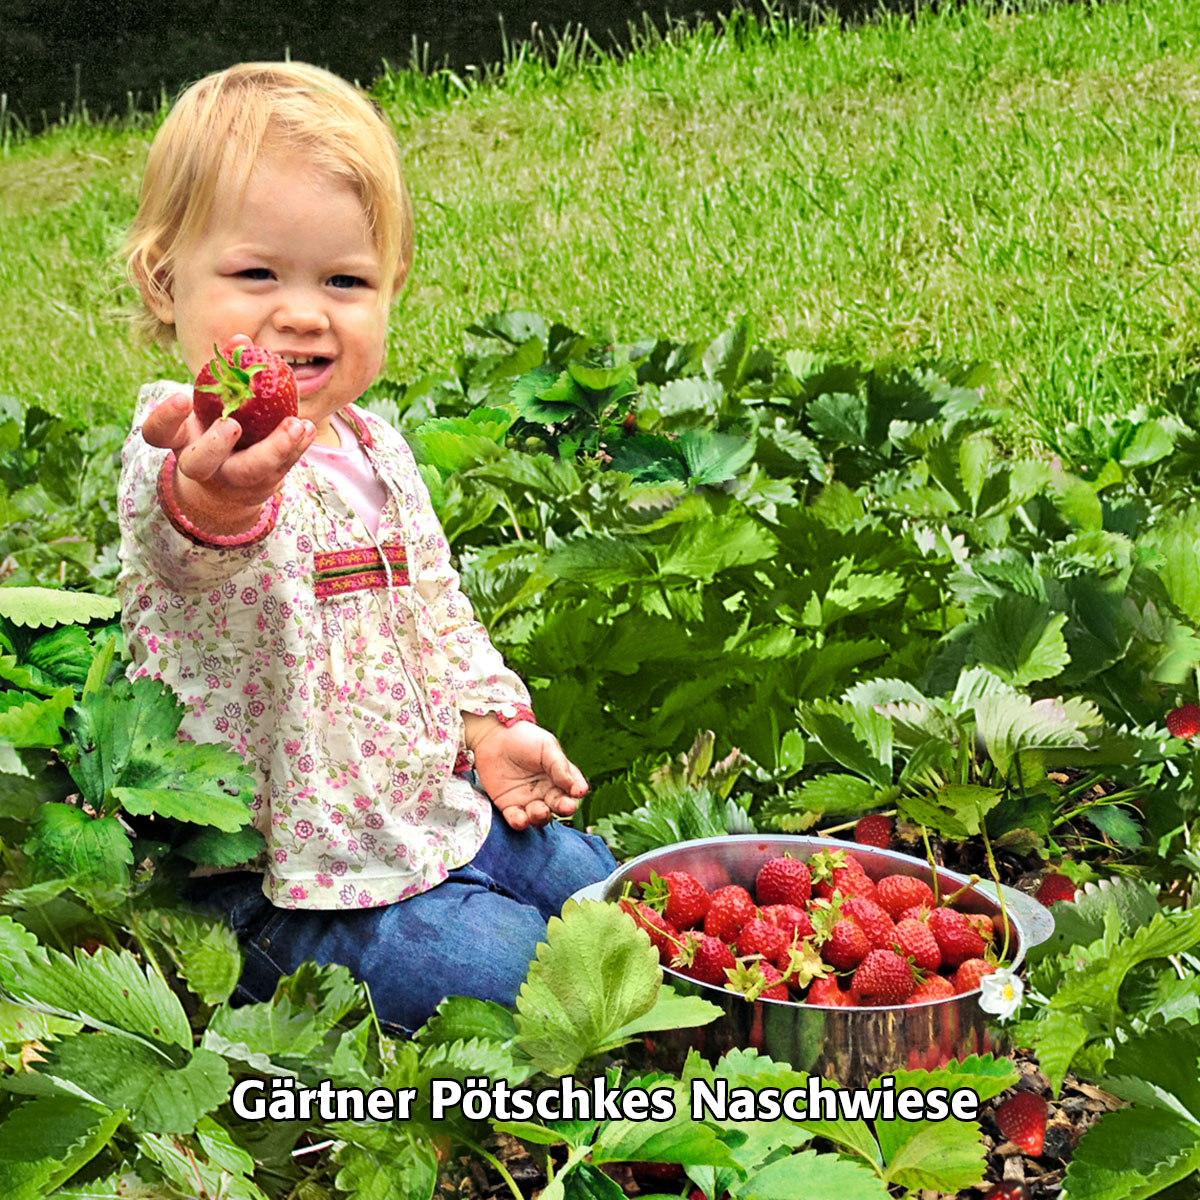 Erdbeerpflanzen-Sortiment Gärtner Pötschkes Auslese, getopft | #4